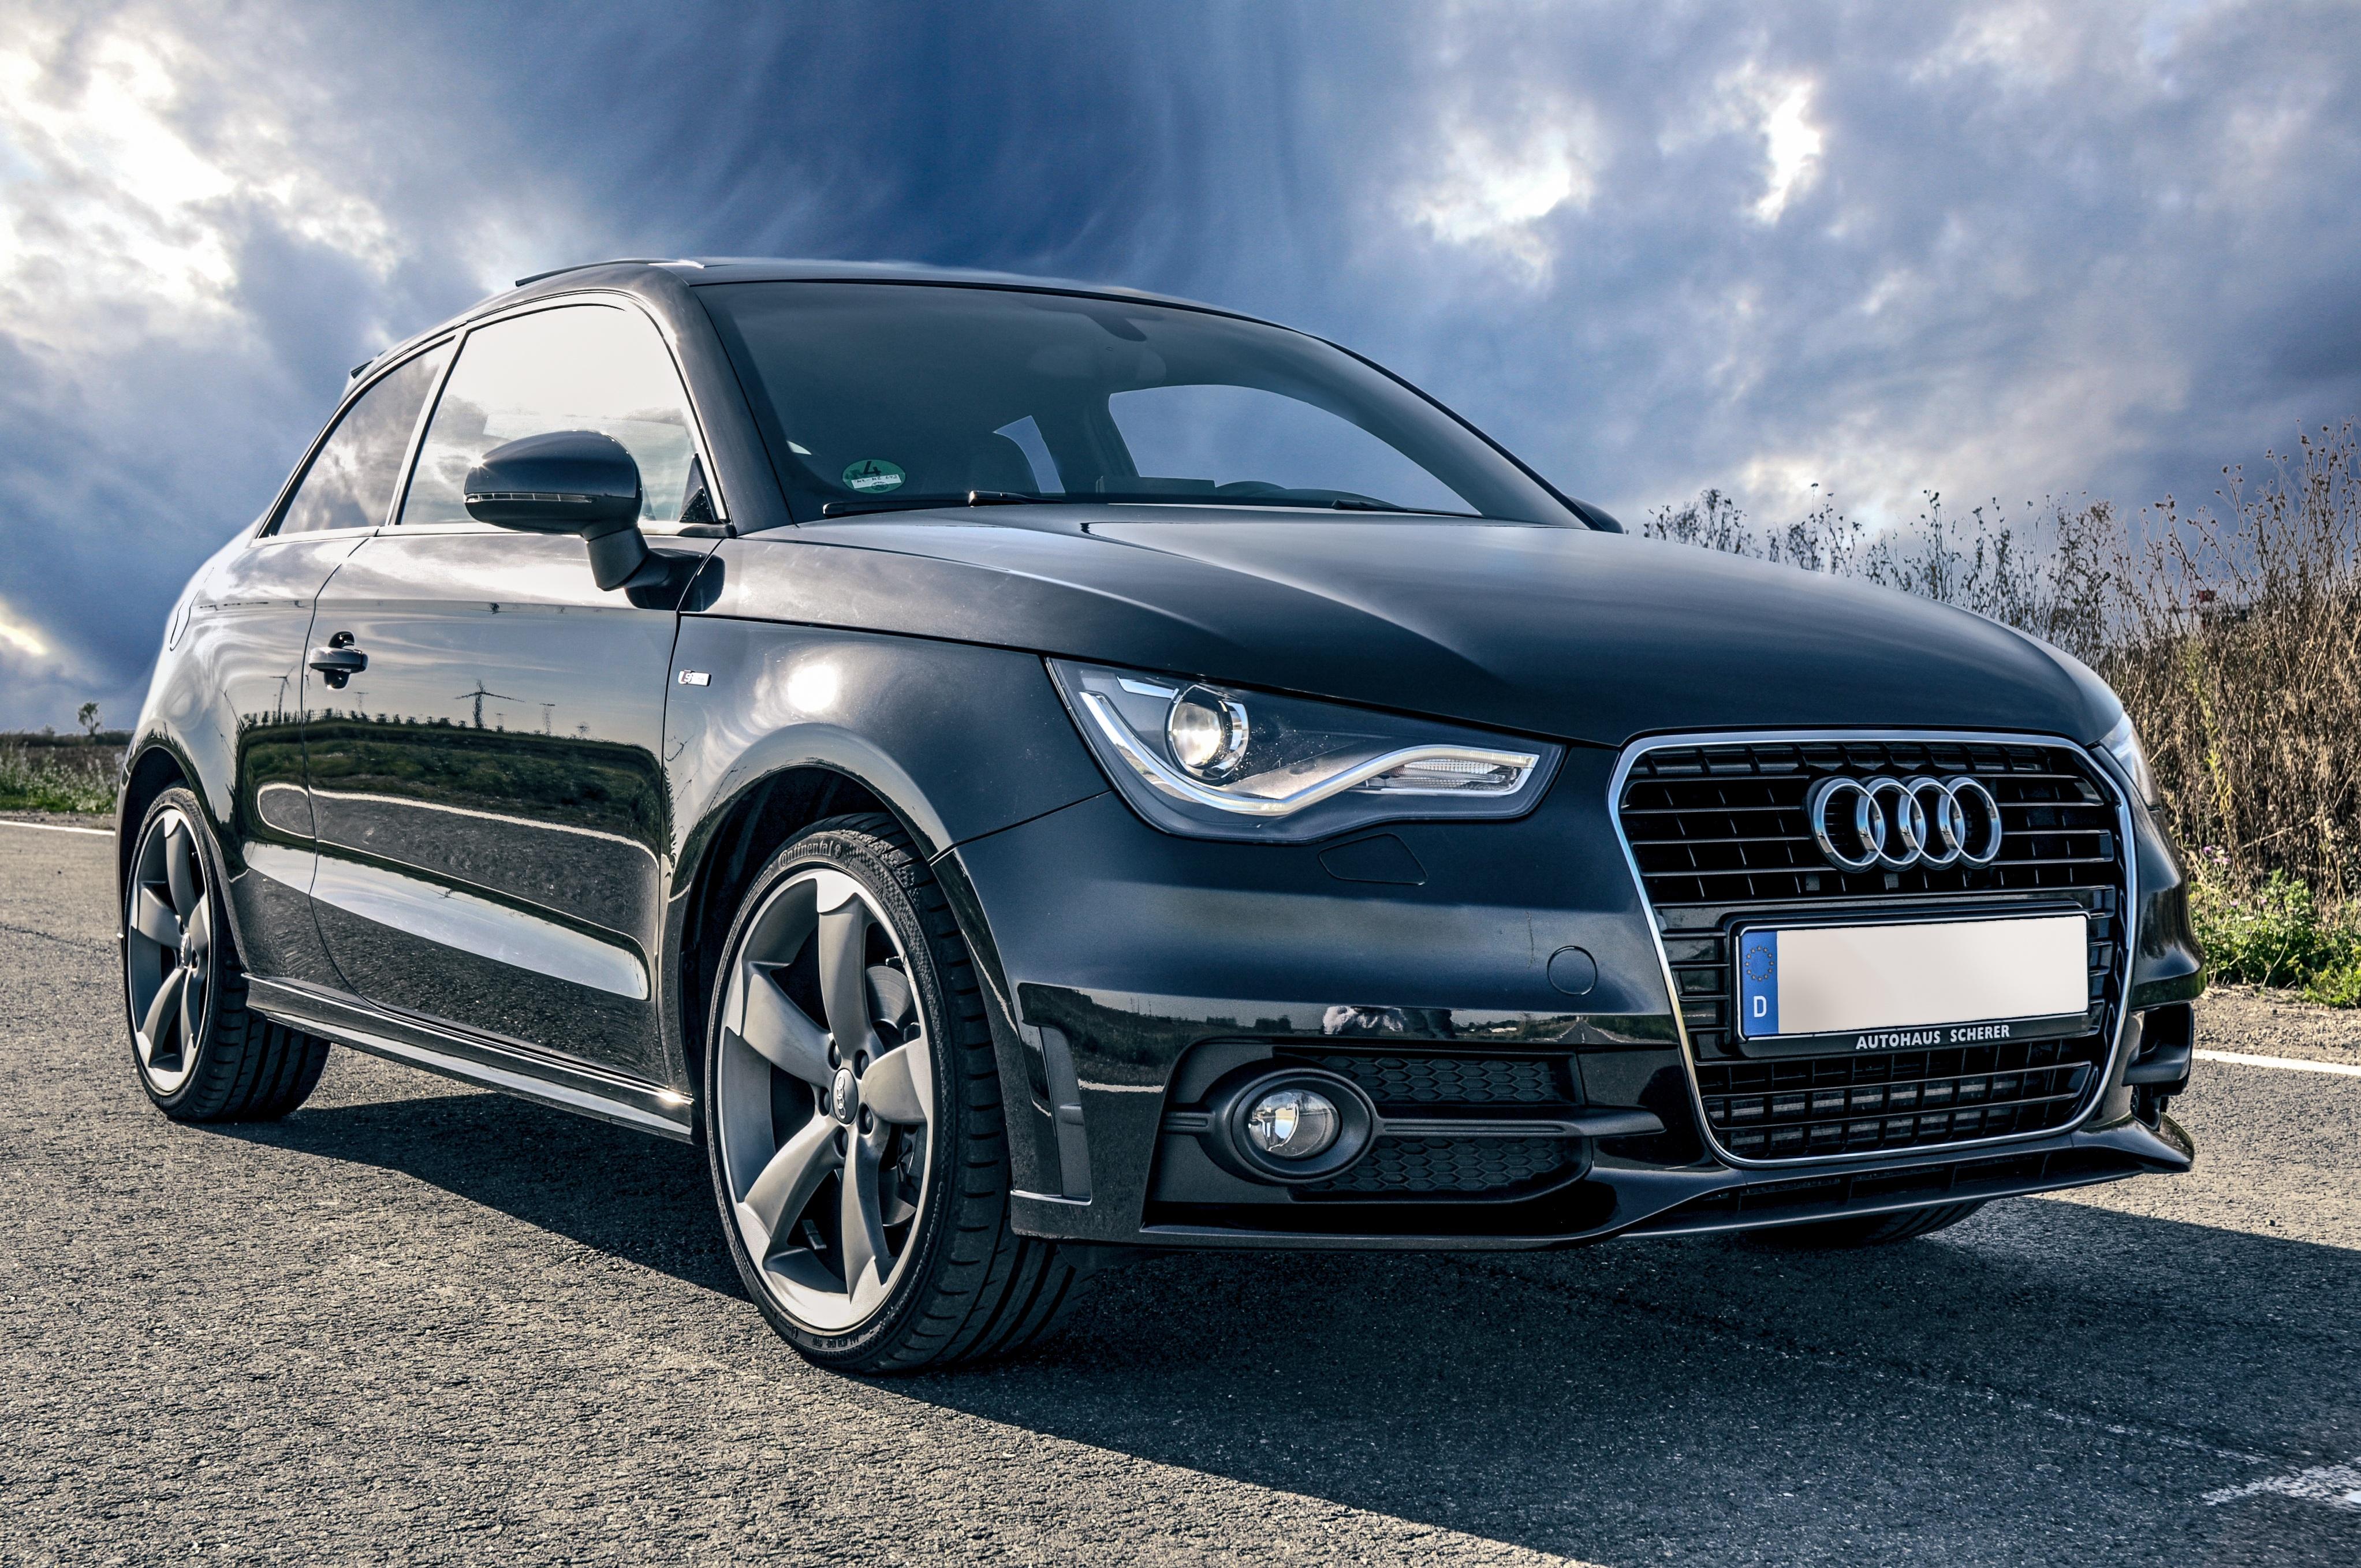 new_car_shopping.jpg